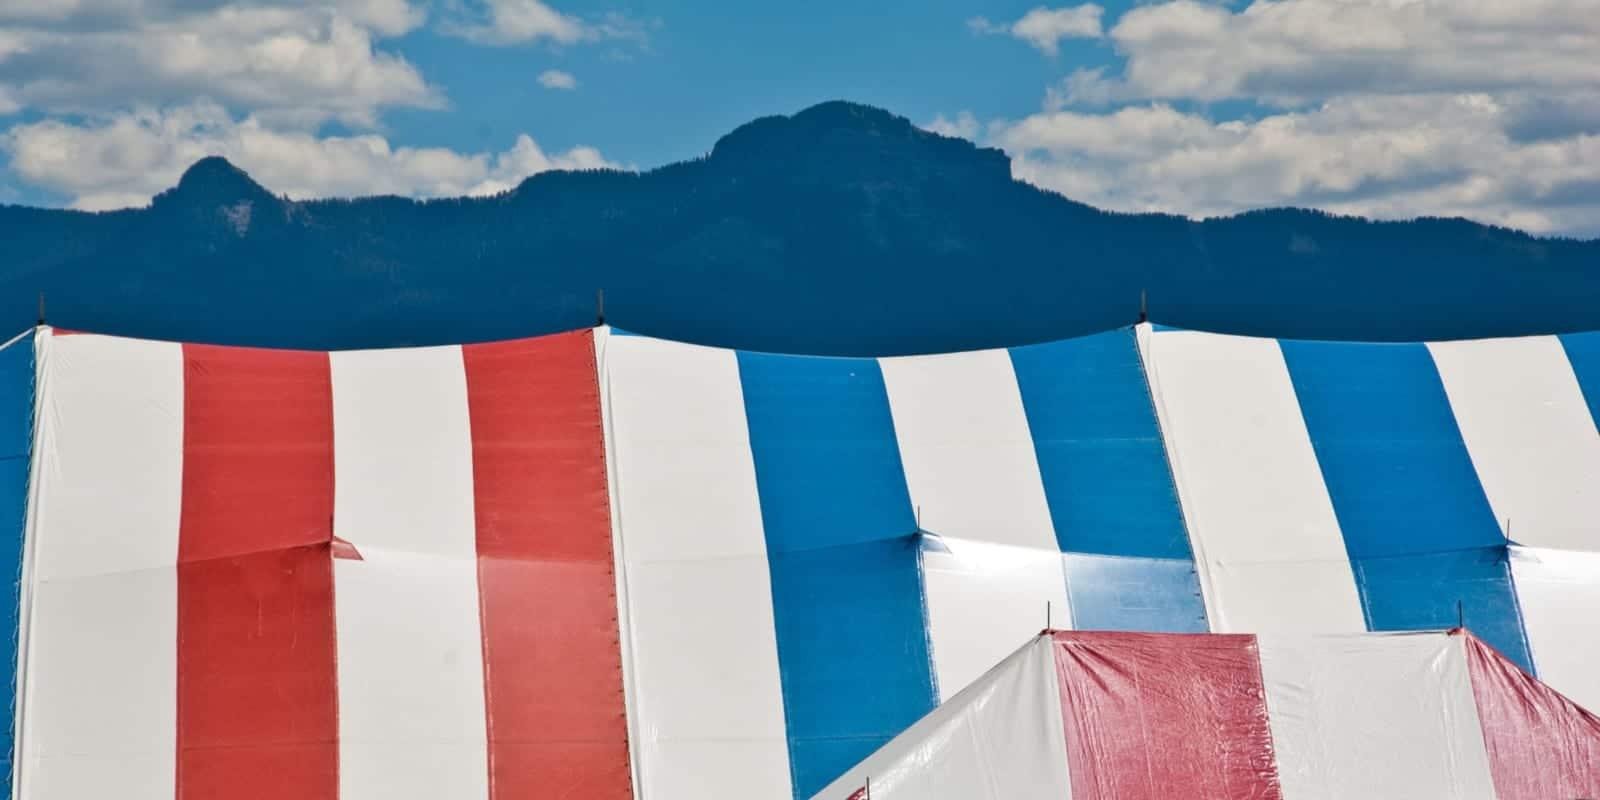 Archuleta County Fair Colorado